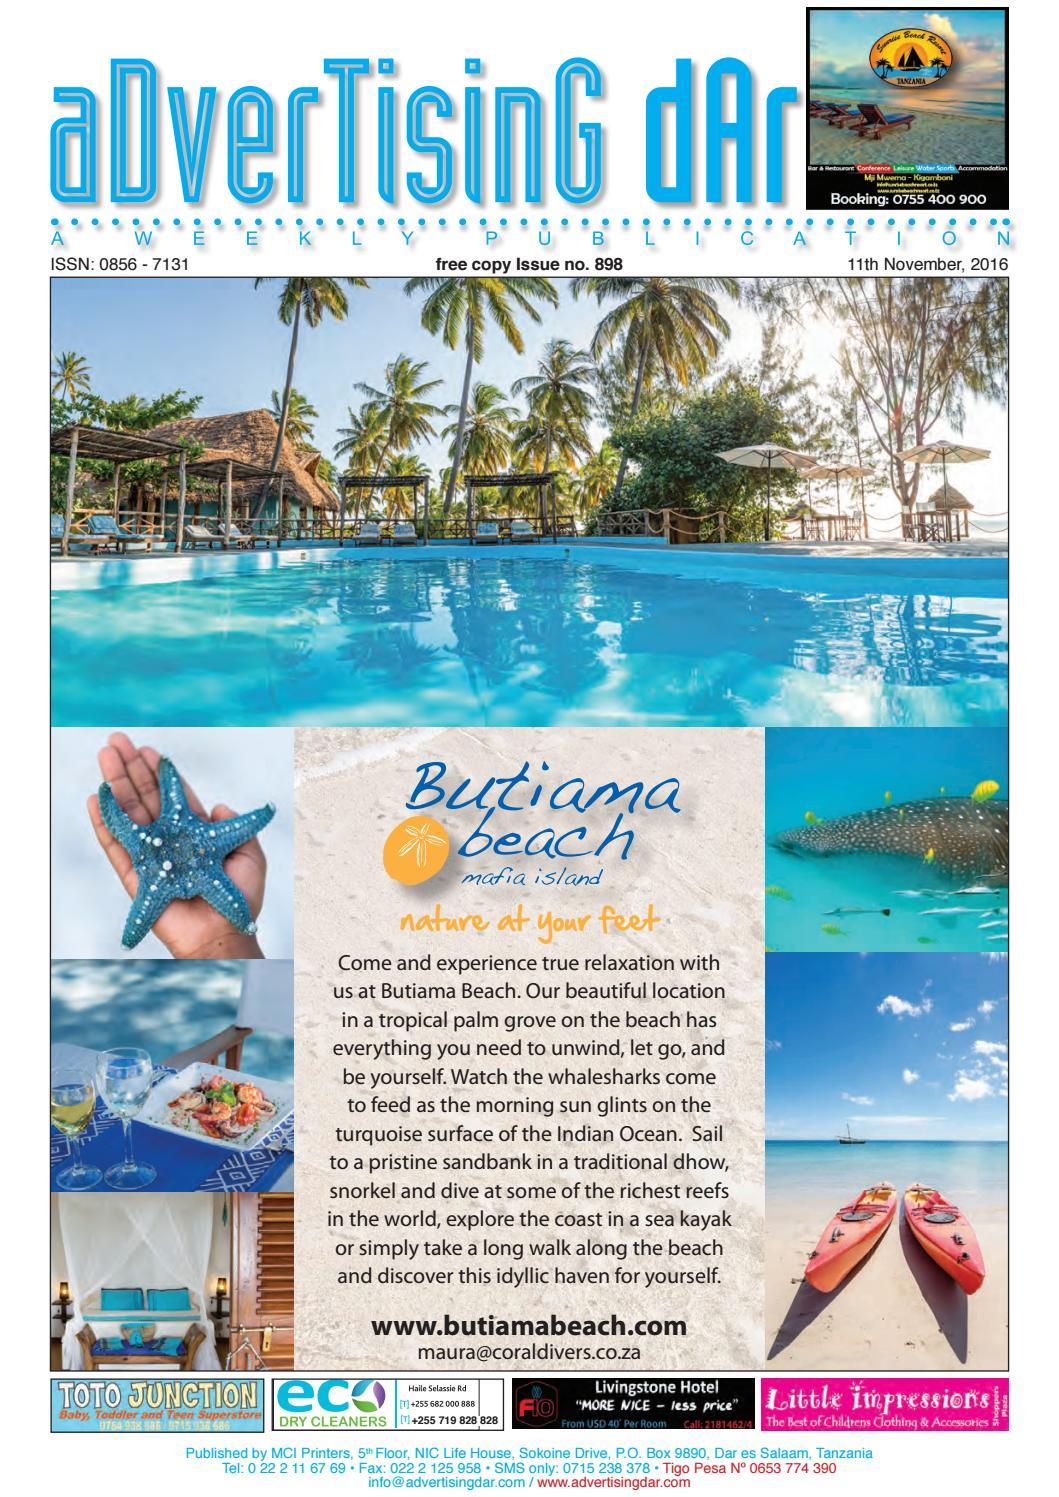 Advertising Dar Issue Nº 898 - 11th November 2016 by